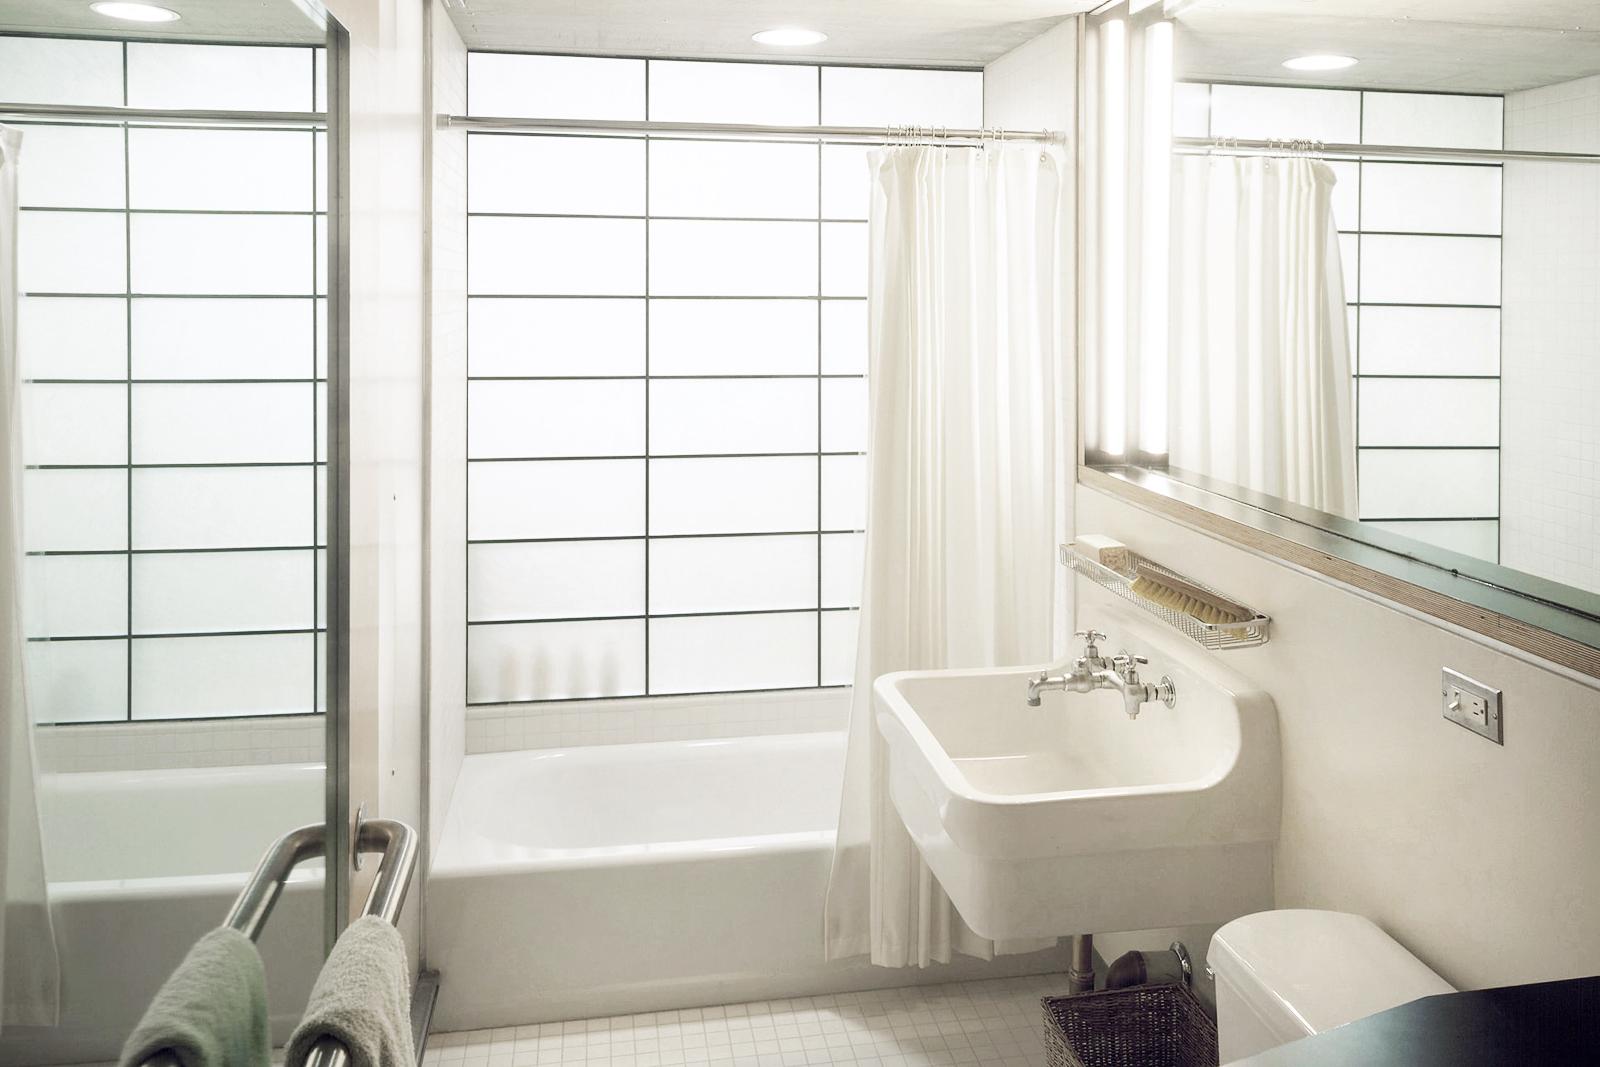 13-res4-resolution-4-architecture-modern-apartment-residential-rons-loft-interior-bathroom.jpg